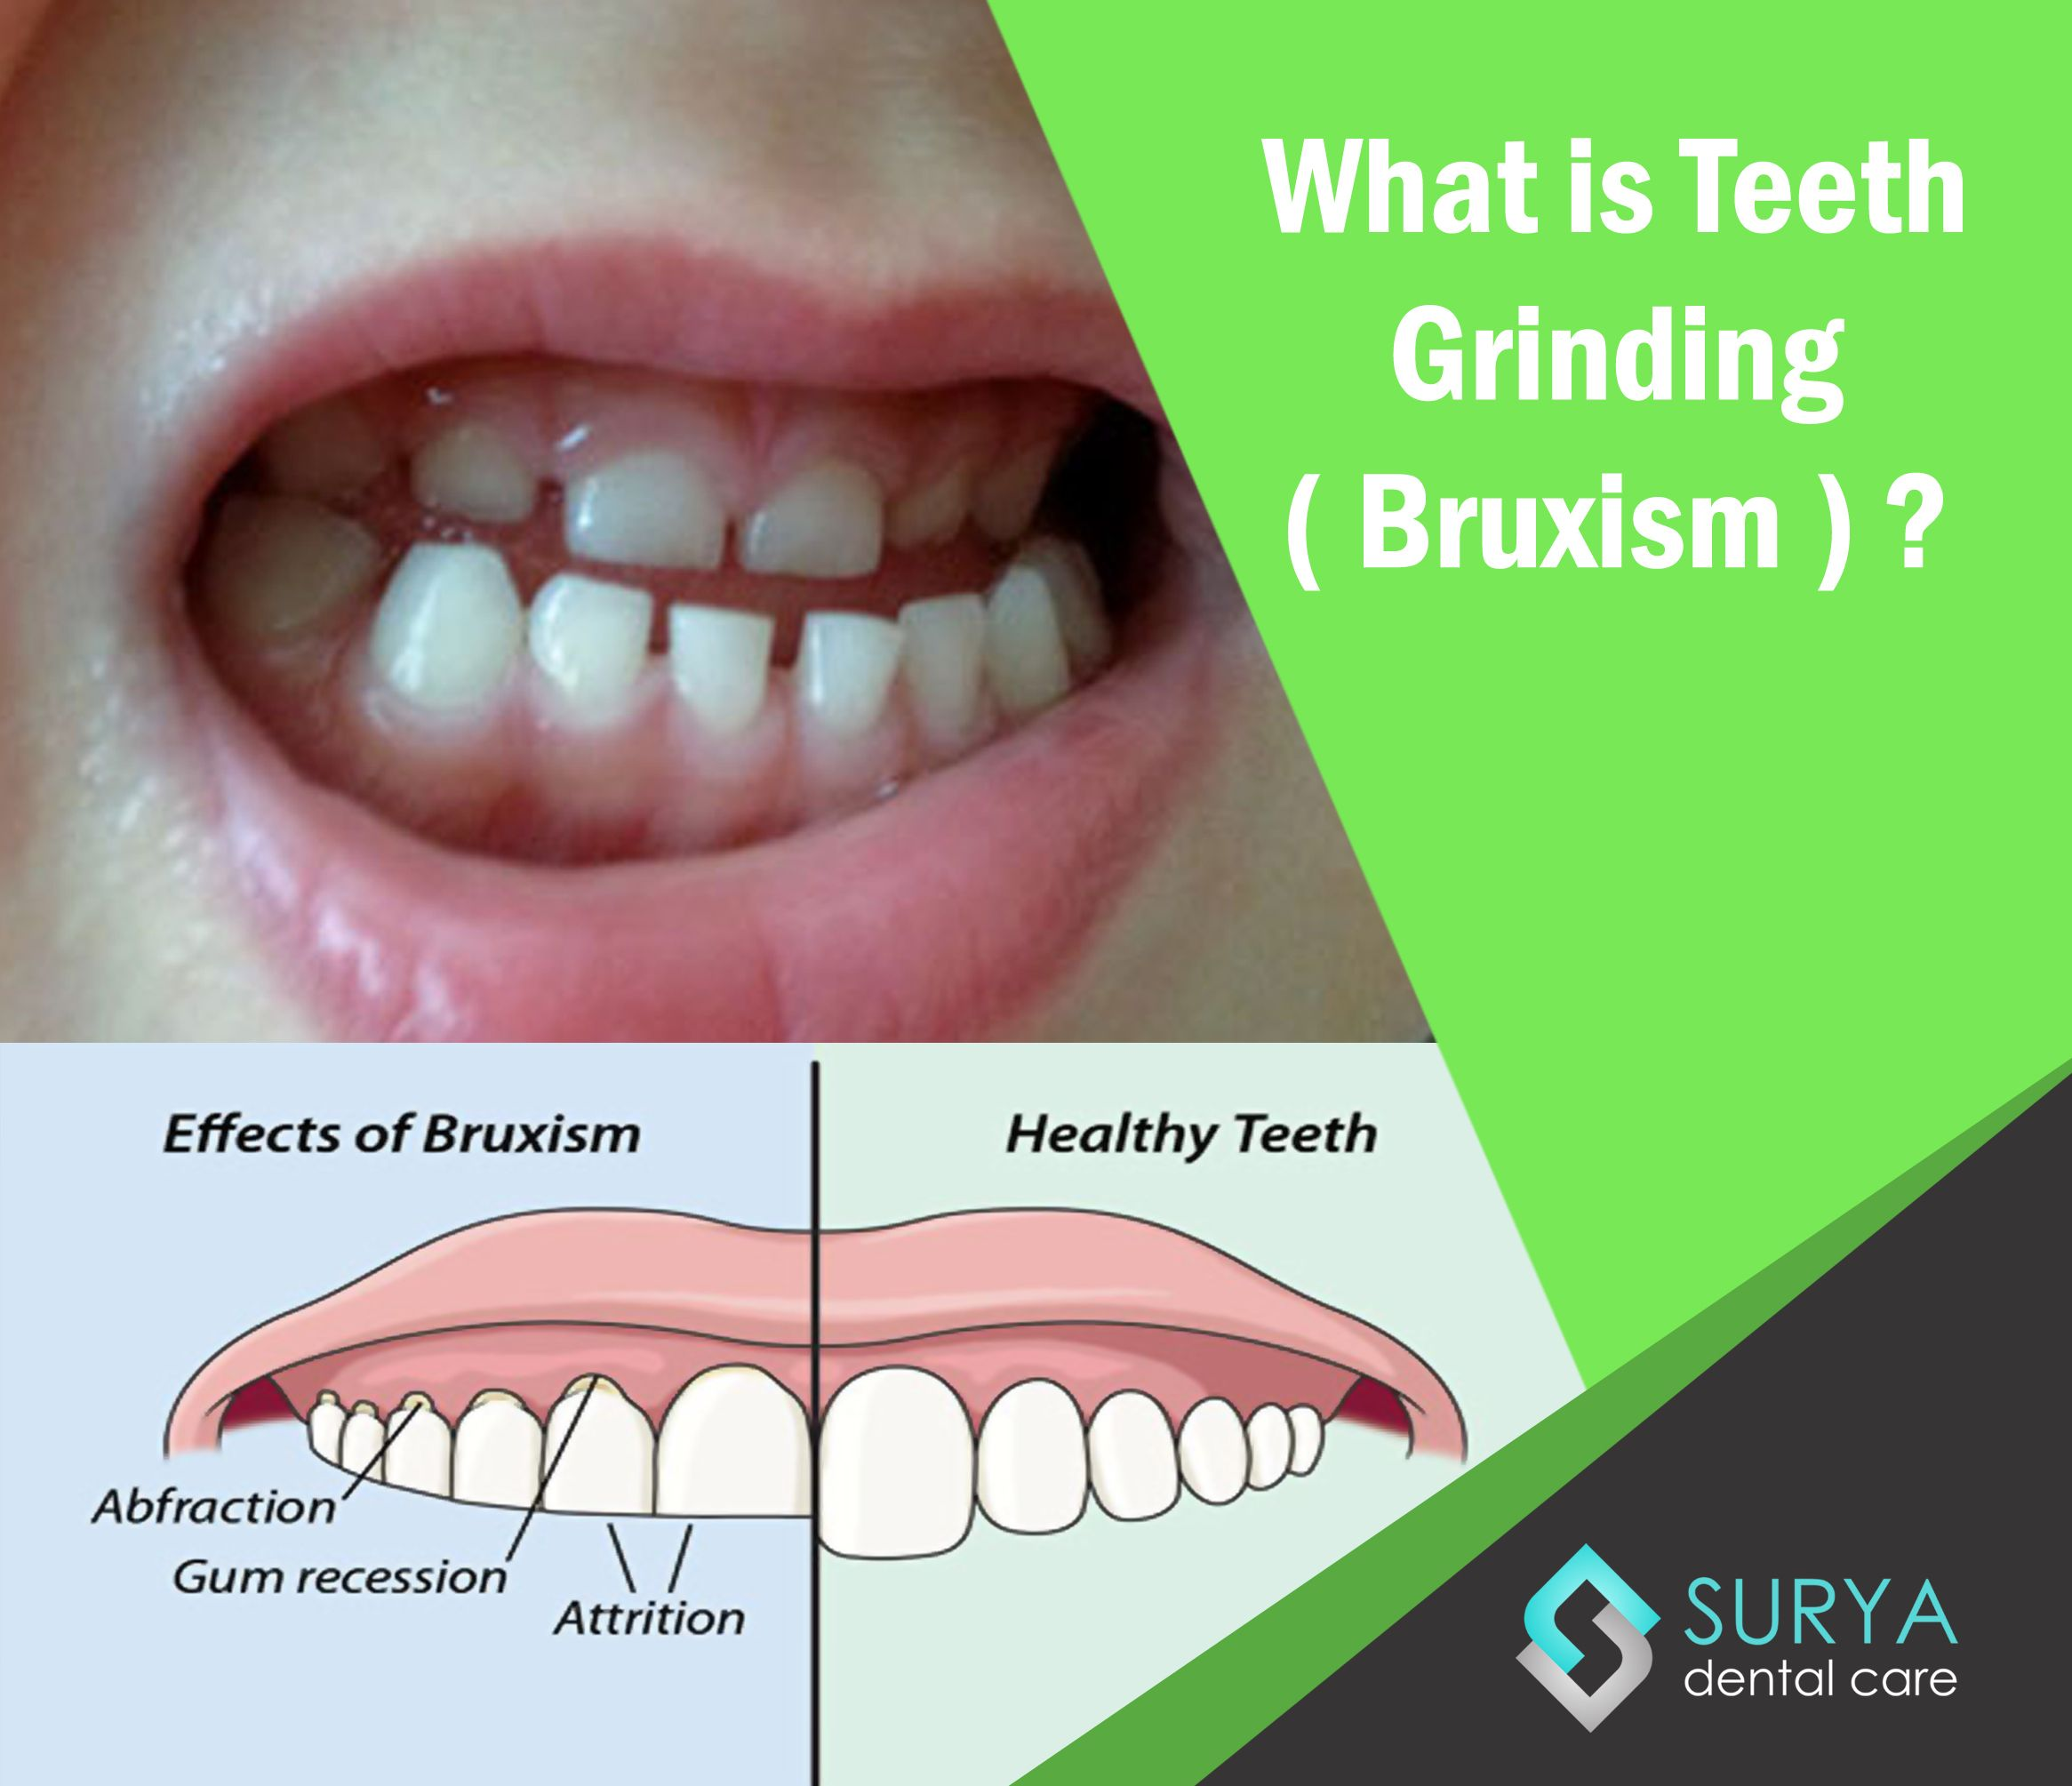 7081edbf15fda3bd6986fc91dcfadd51 - How To Get My Kid To Stop Grinding Teeth